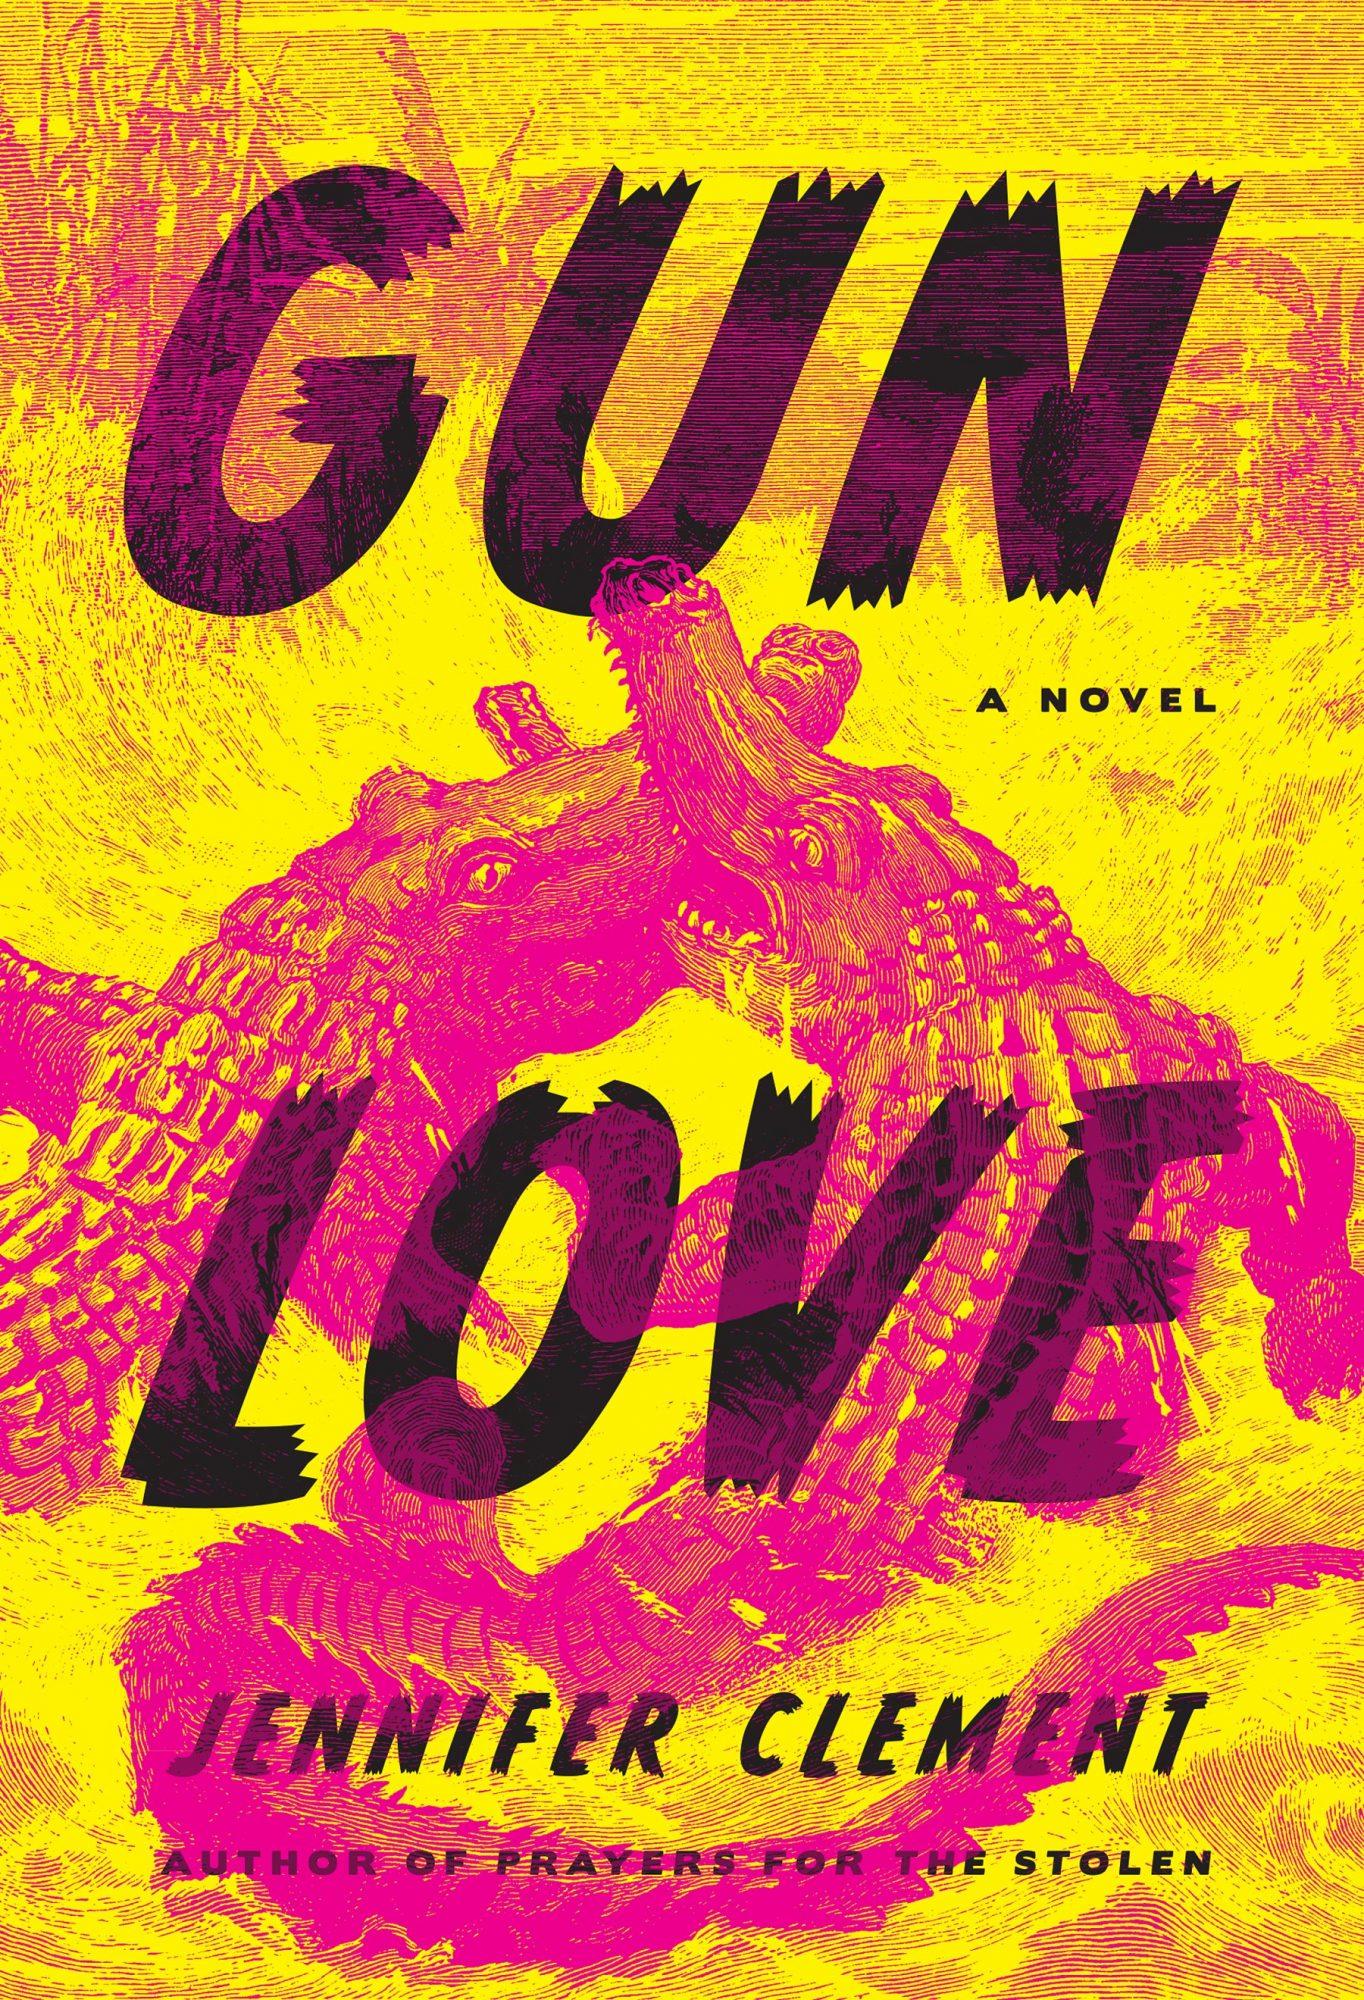 Gun Love by Jennifer Clement CR: Crown/Archetype